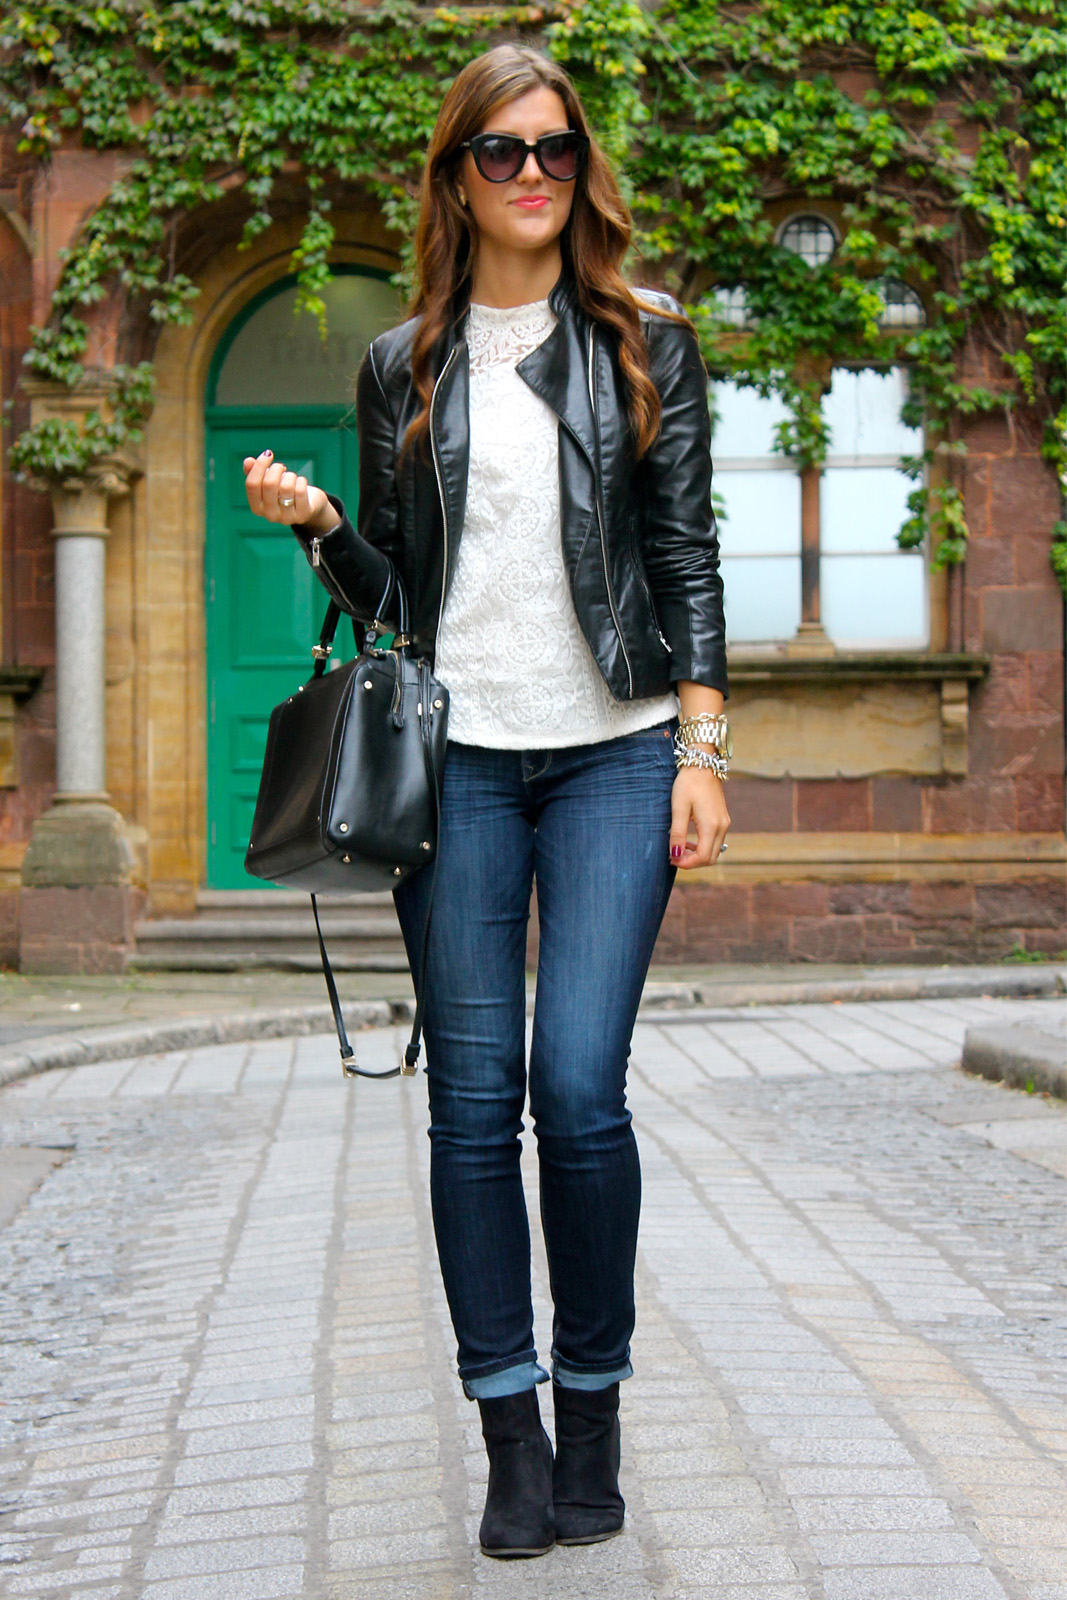 Wajib Punya! 5 Celana Ini Akan Buat Kamu Semakin Trendi